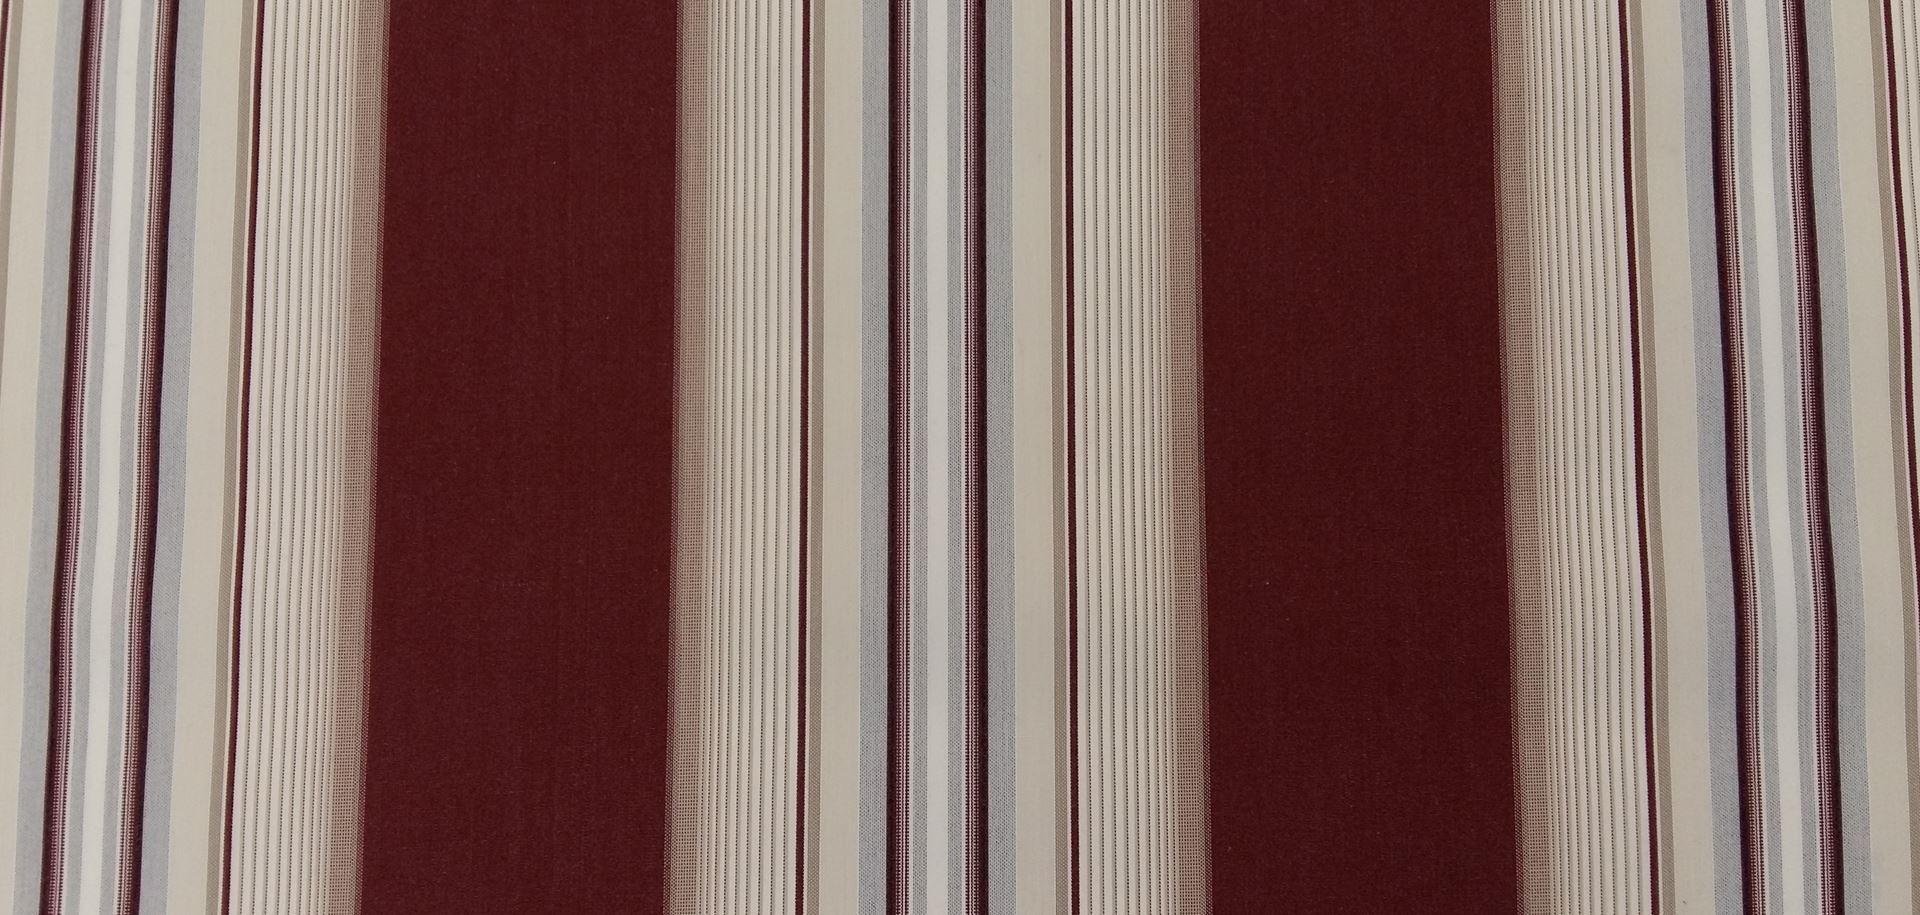 Rollersur toldo vertical tela lona acrilica rayada - Tela de toldos ...